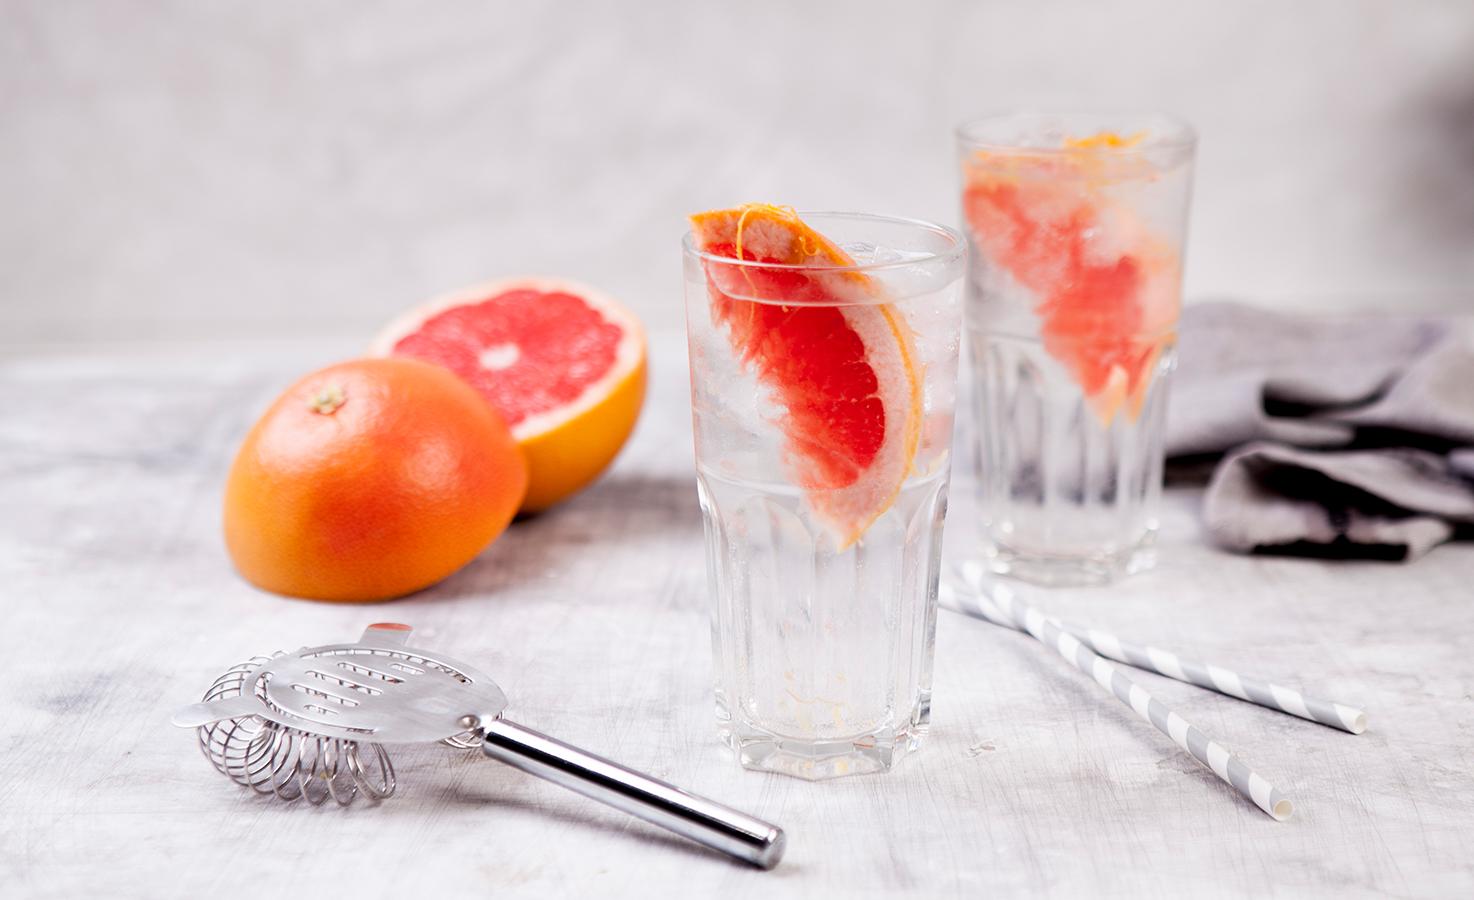 001_Hoos-Pink-Grapefruit-Gin-TonicJdmqKecFxWHuQ